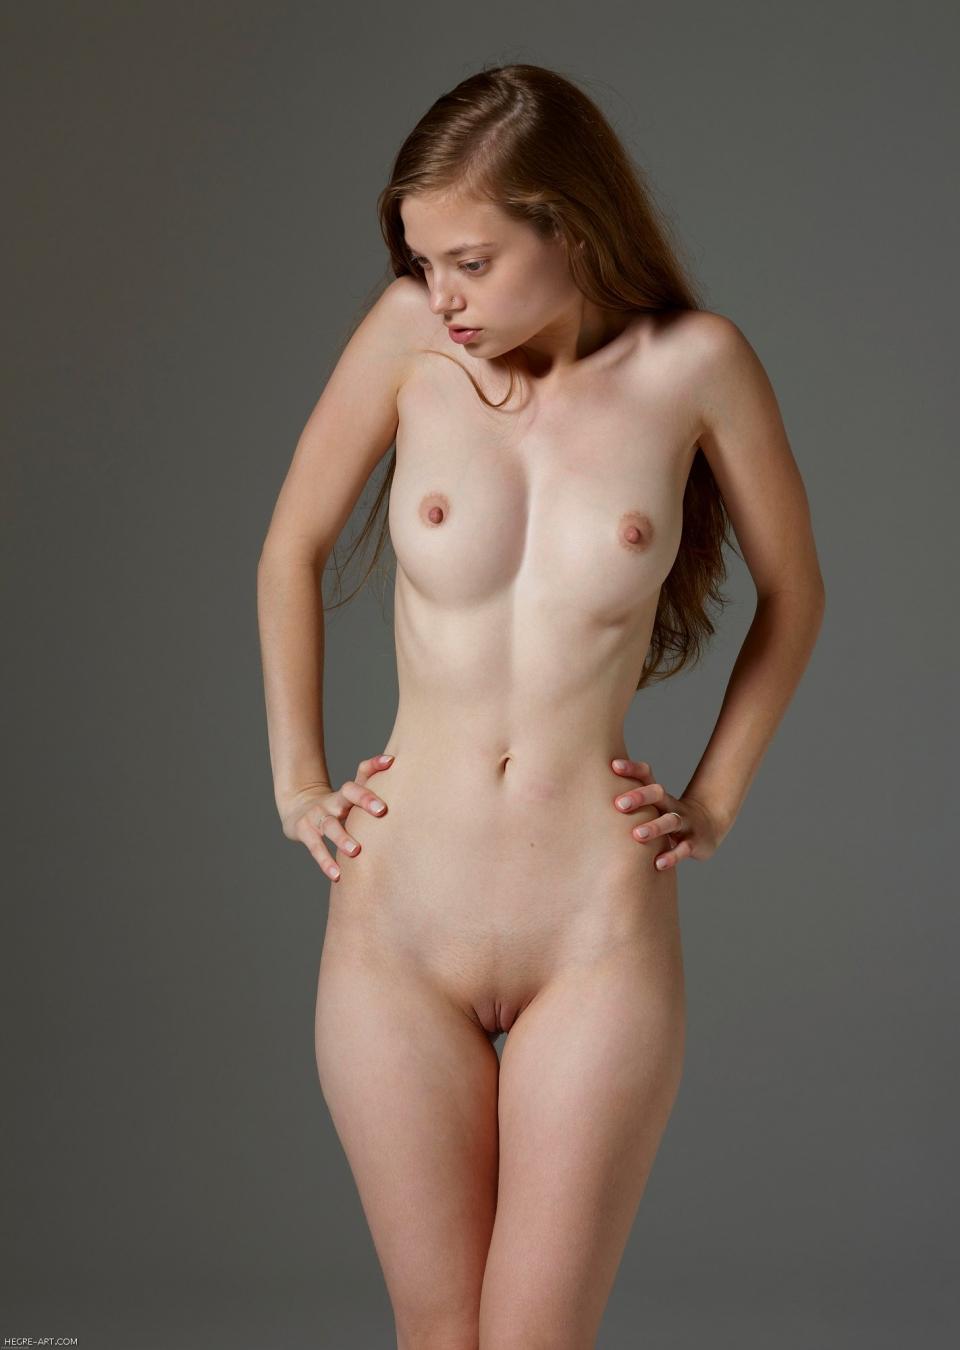 Fairy nudes fucking image